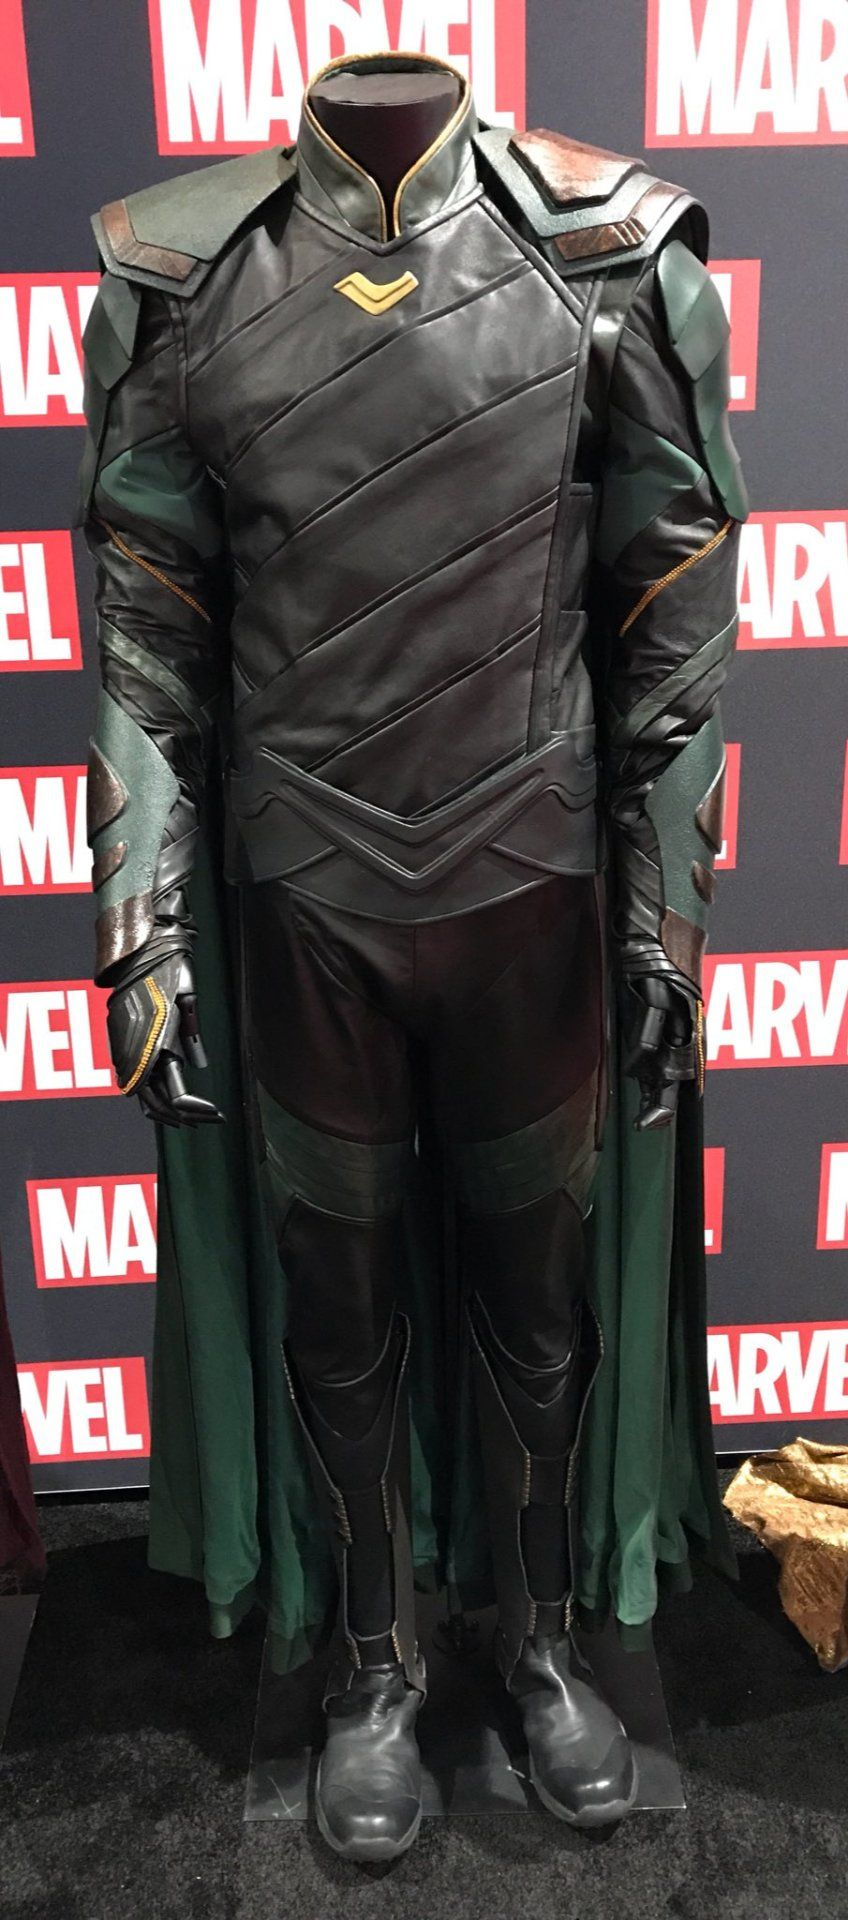 The Avengers Thor 3 Ragnarok Loki Tom Sakaar Cape Cosplay Costume Outfit Suit